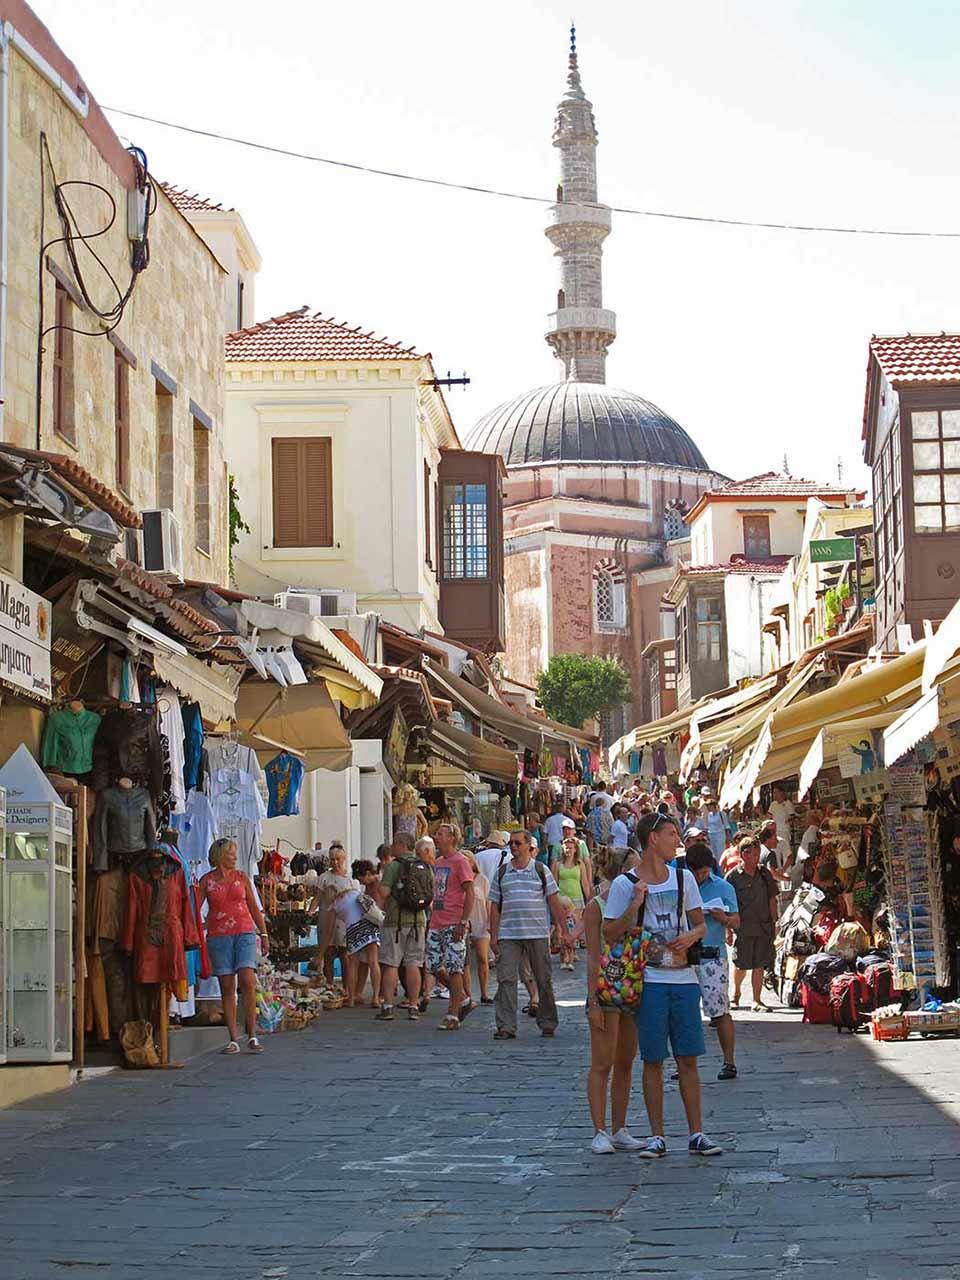 Rodos Eski Şehir, Çarsı. Rodos Gezi Rehberi - Live Love Thank